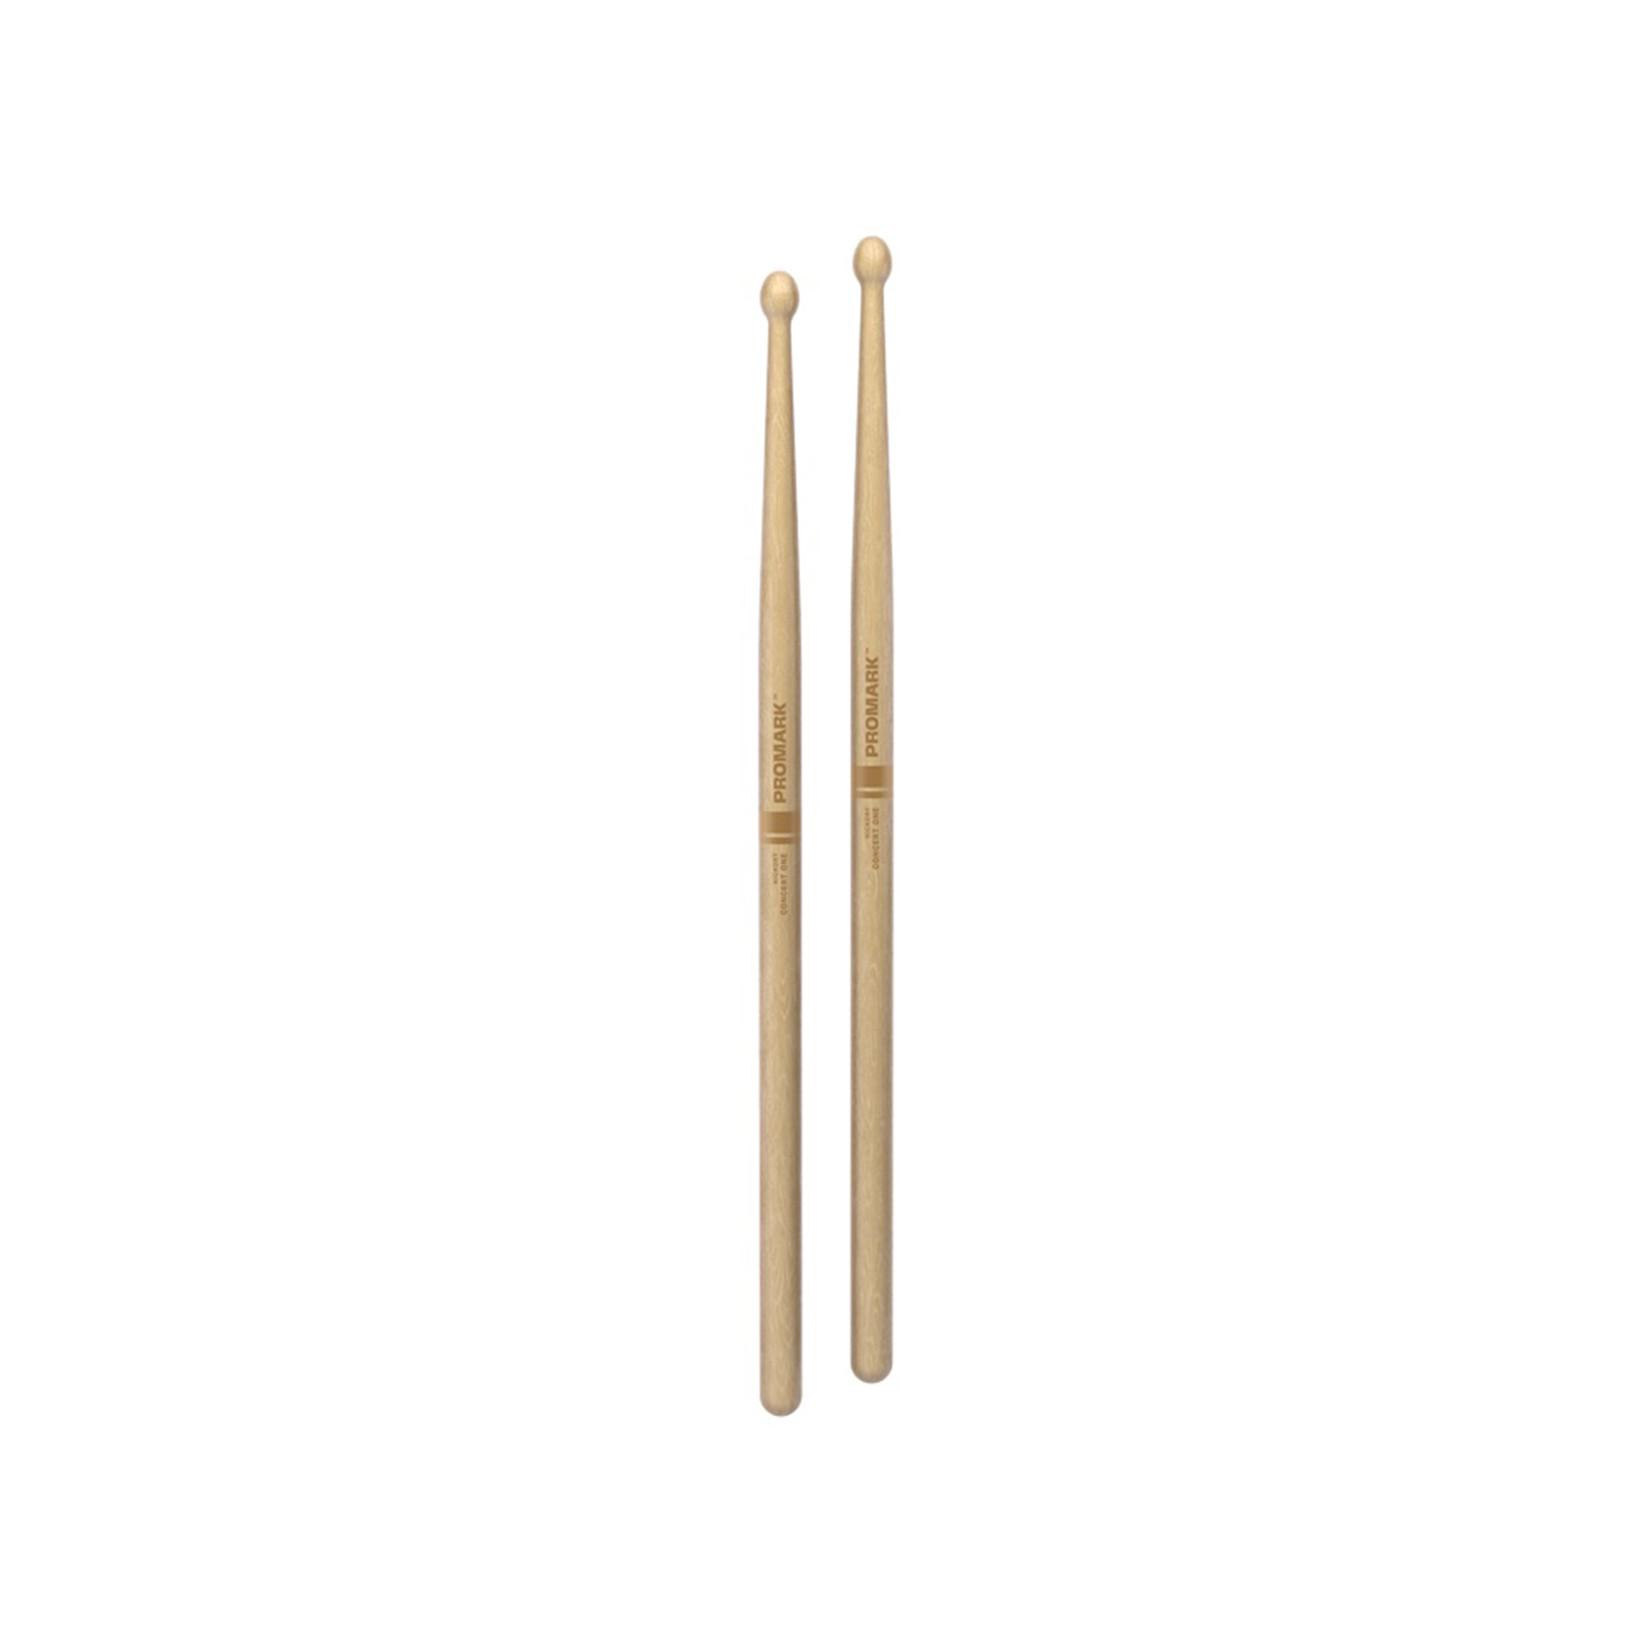 Promark Promark Concert One Snare Drum Stick